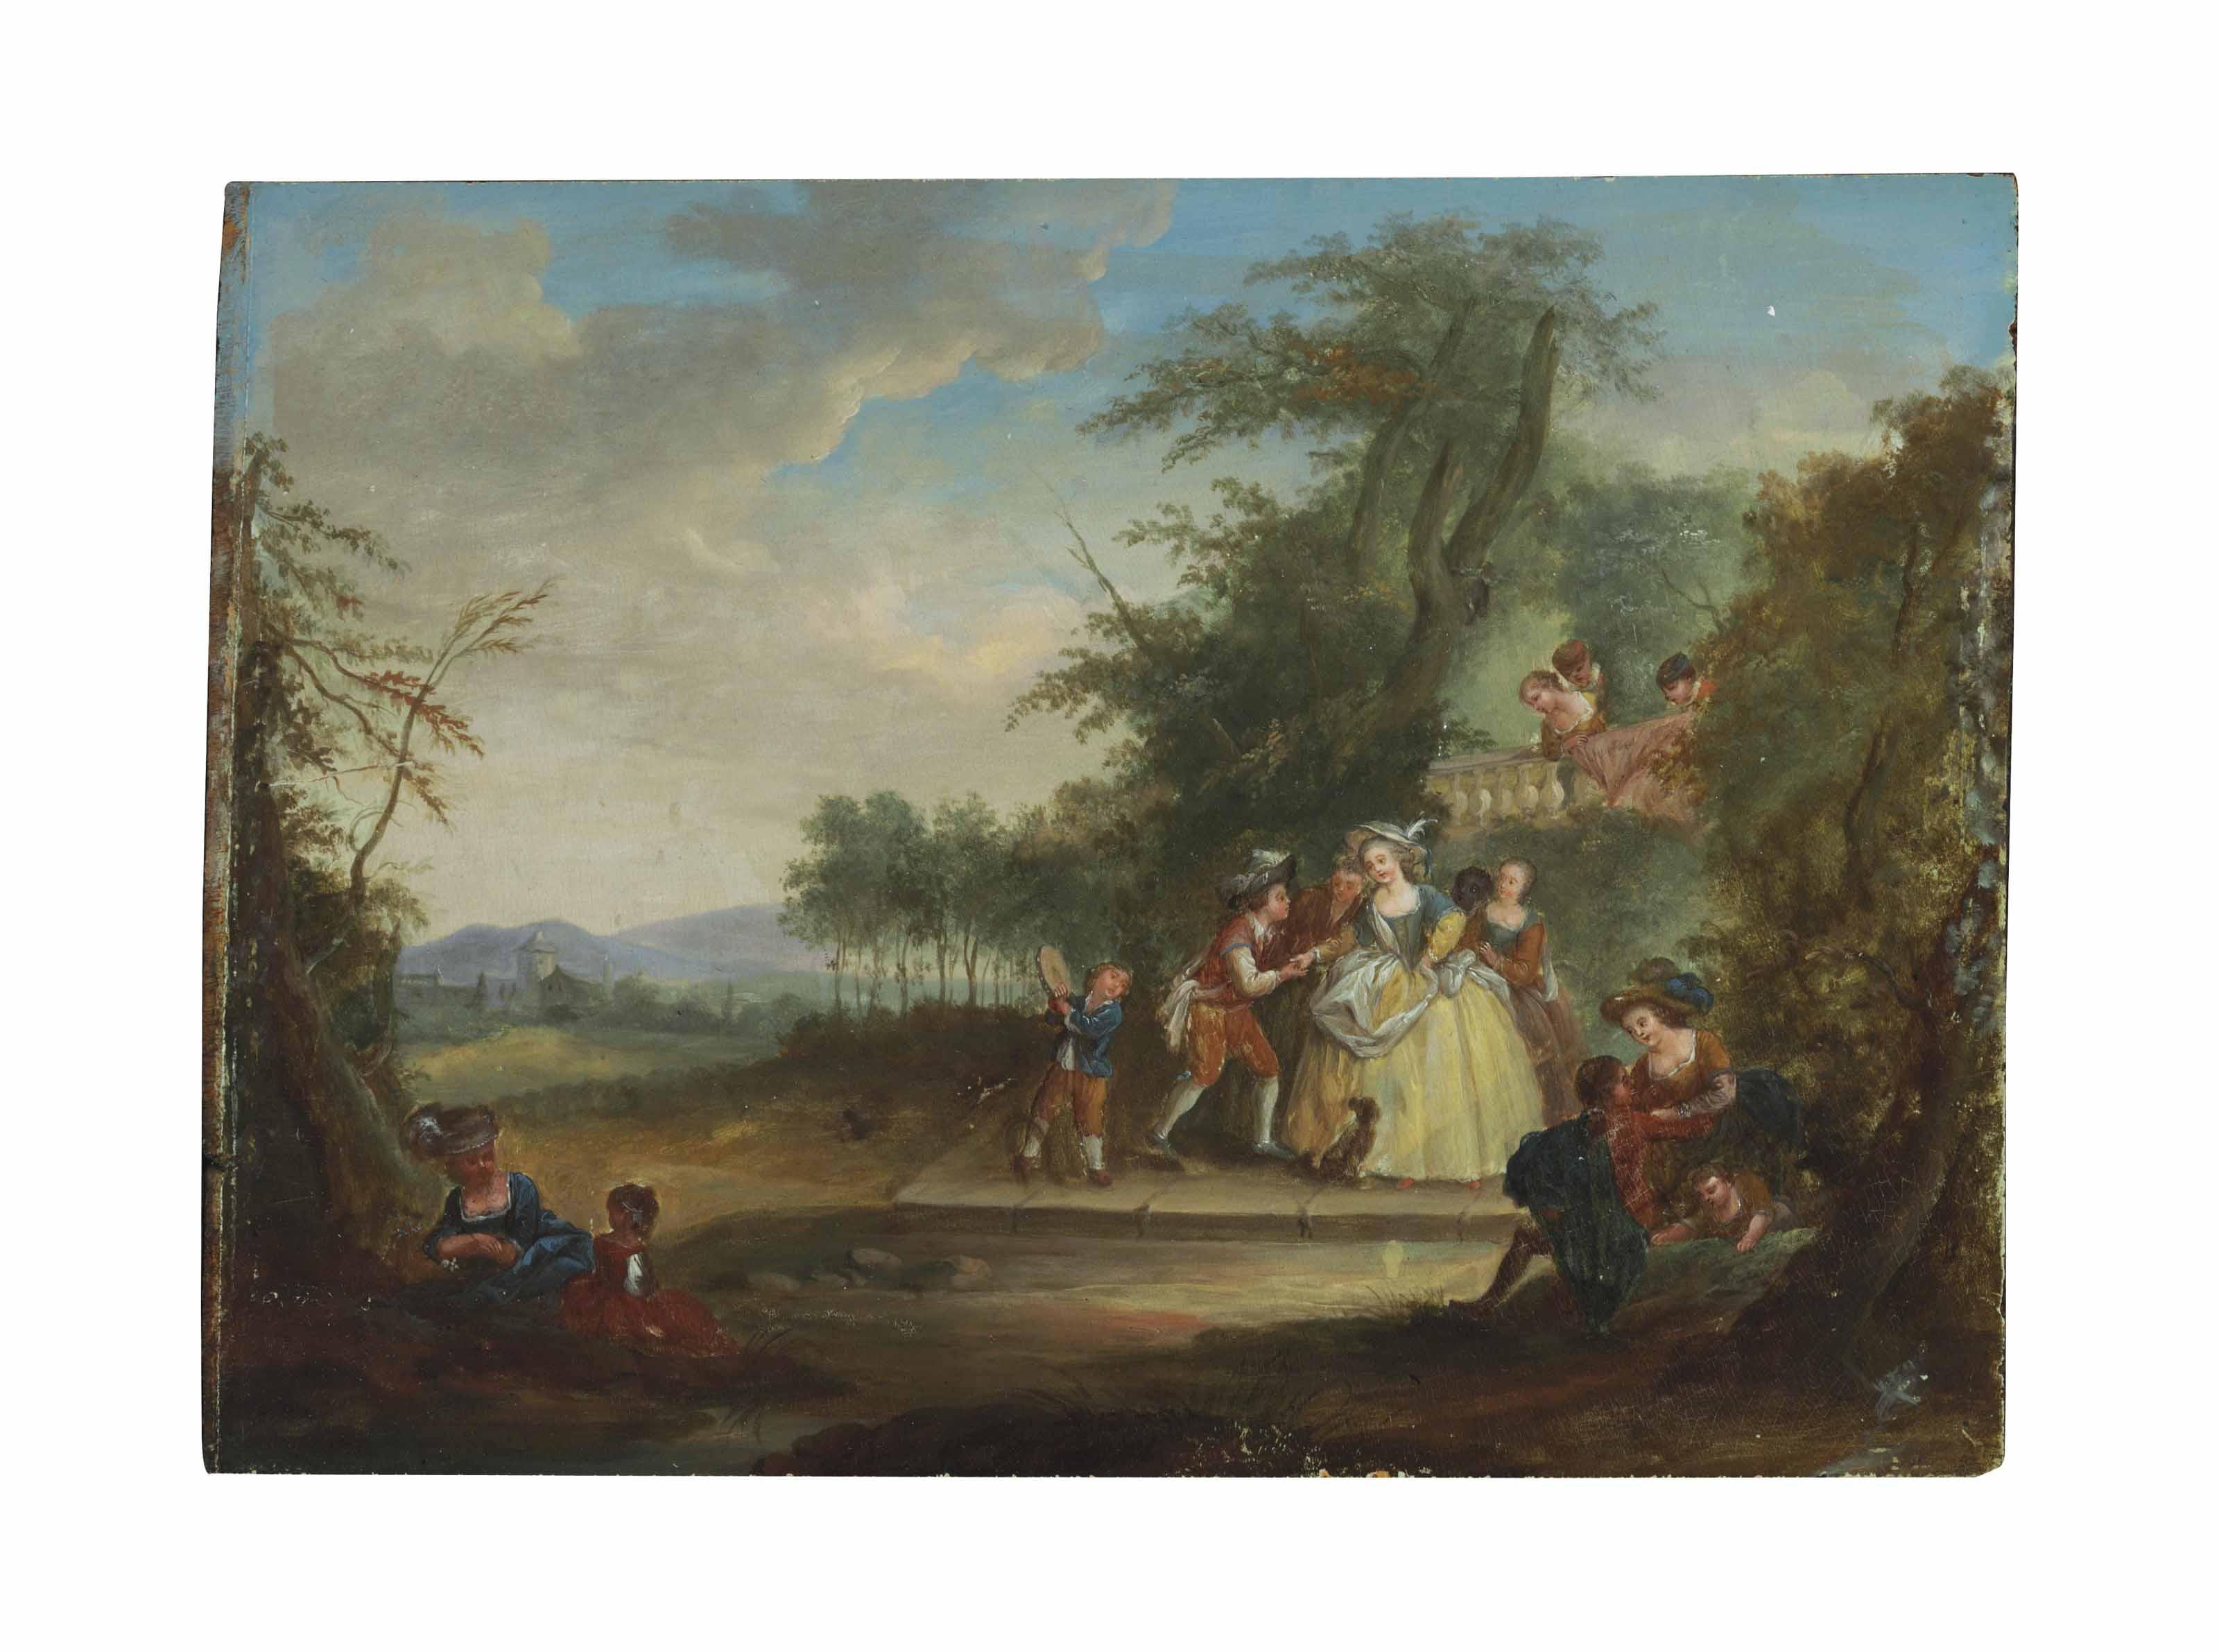 Fêtes Champêtres; and a companion painting